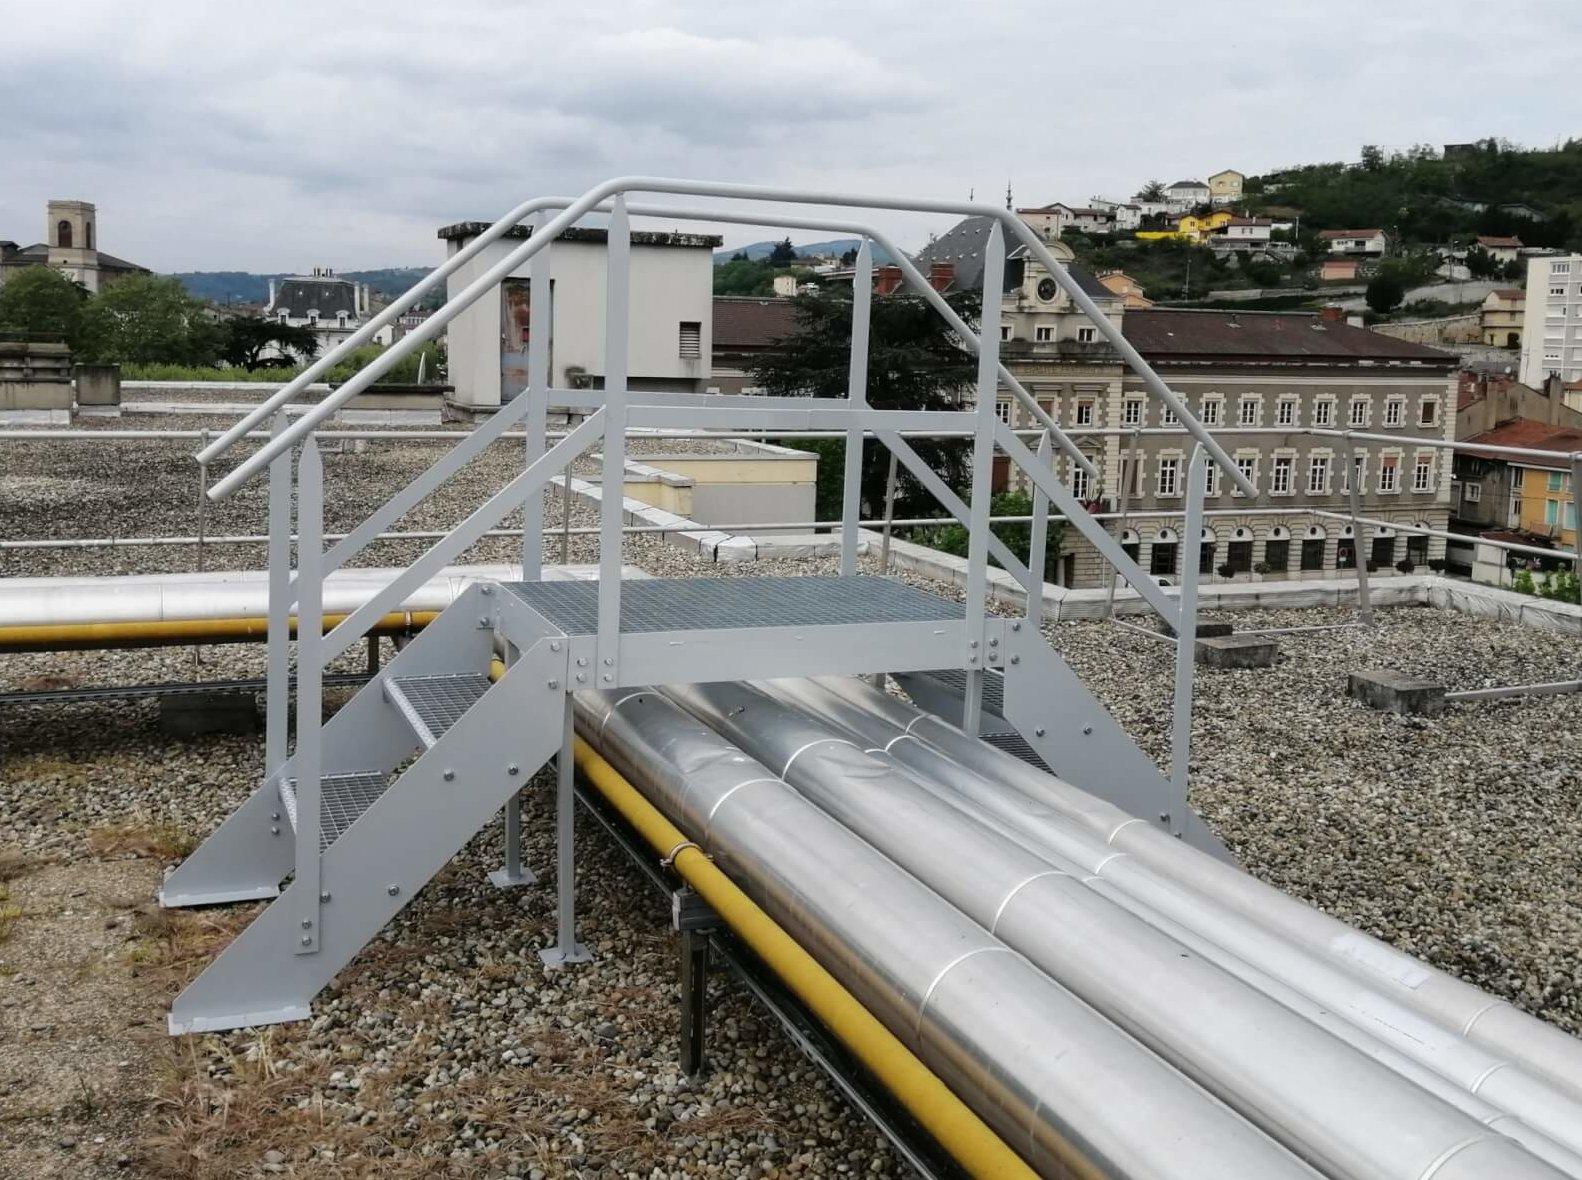 Fabrication et installation dune passerelle en acier galvanisée sur-mesure